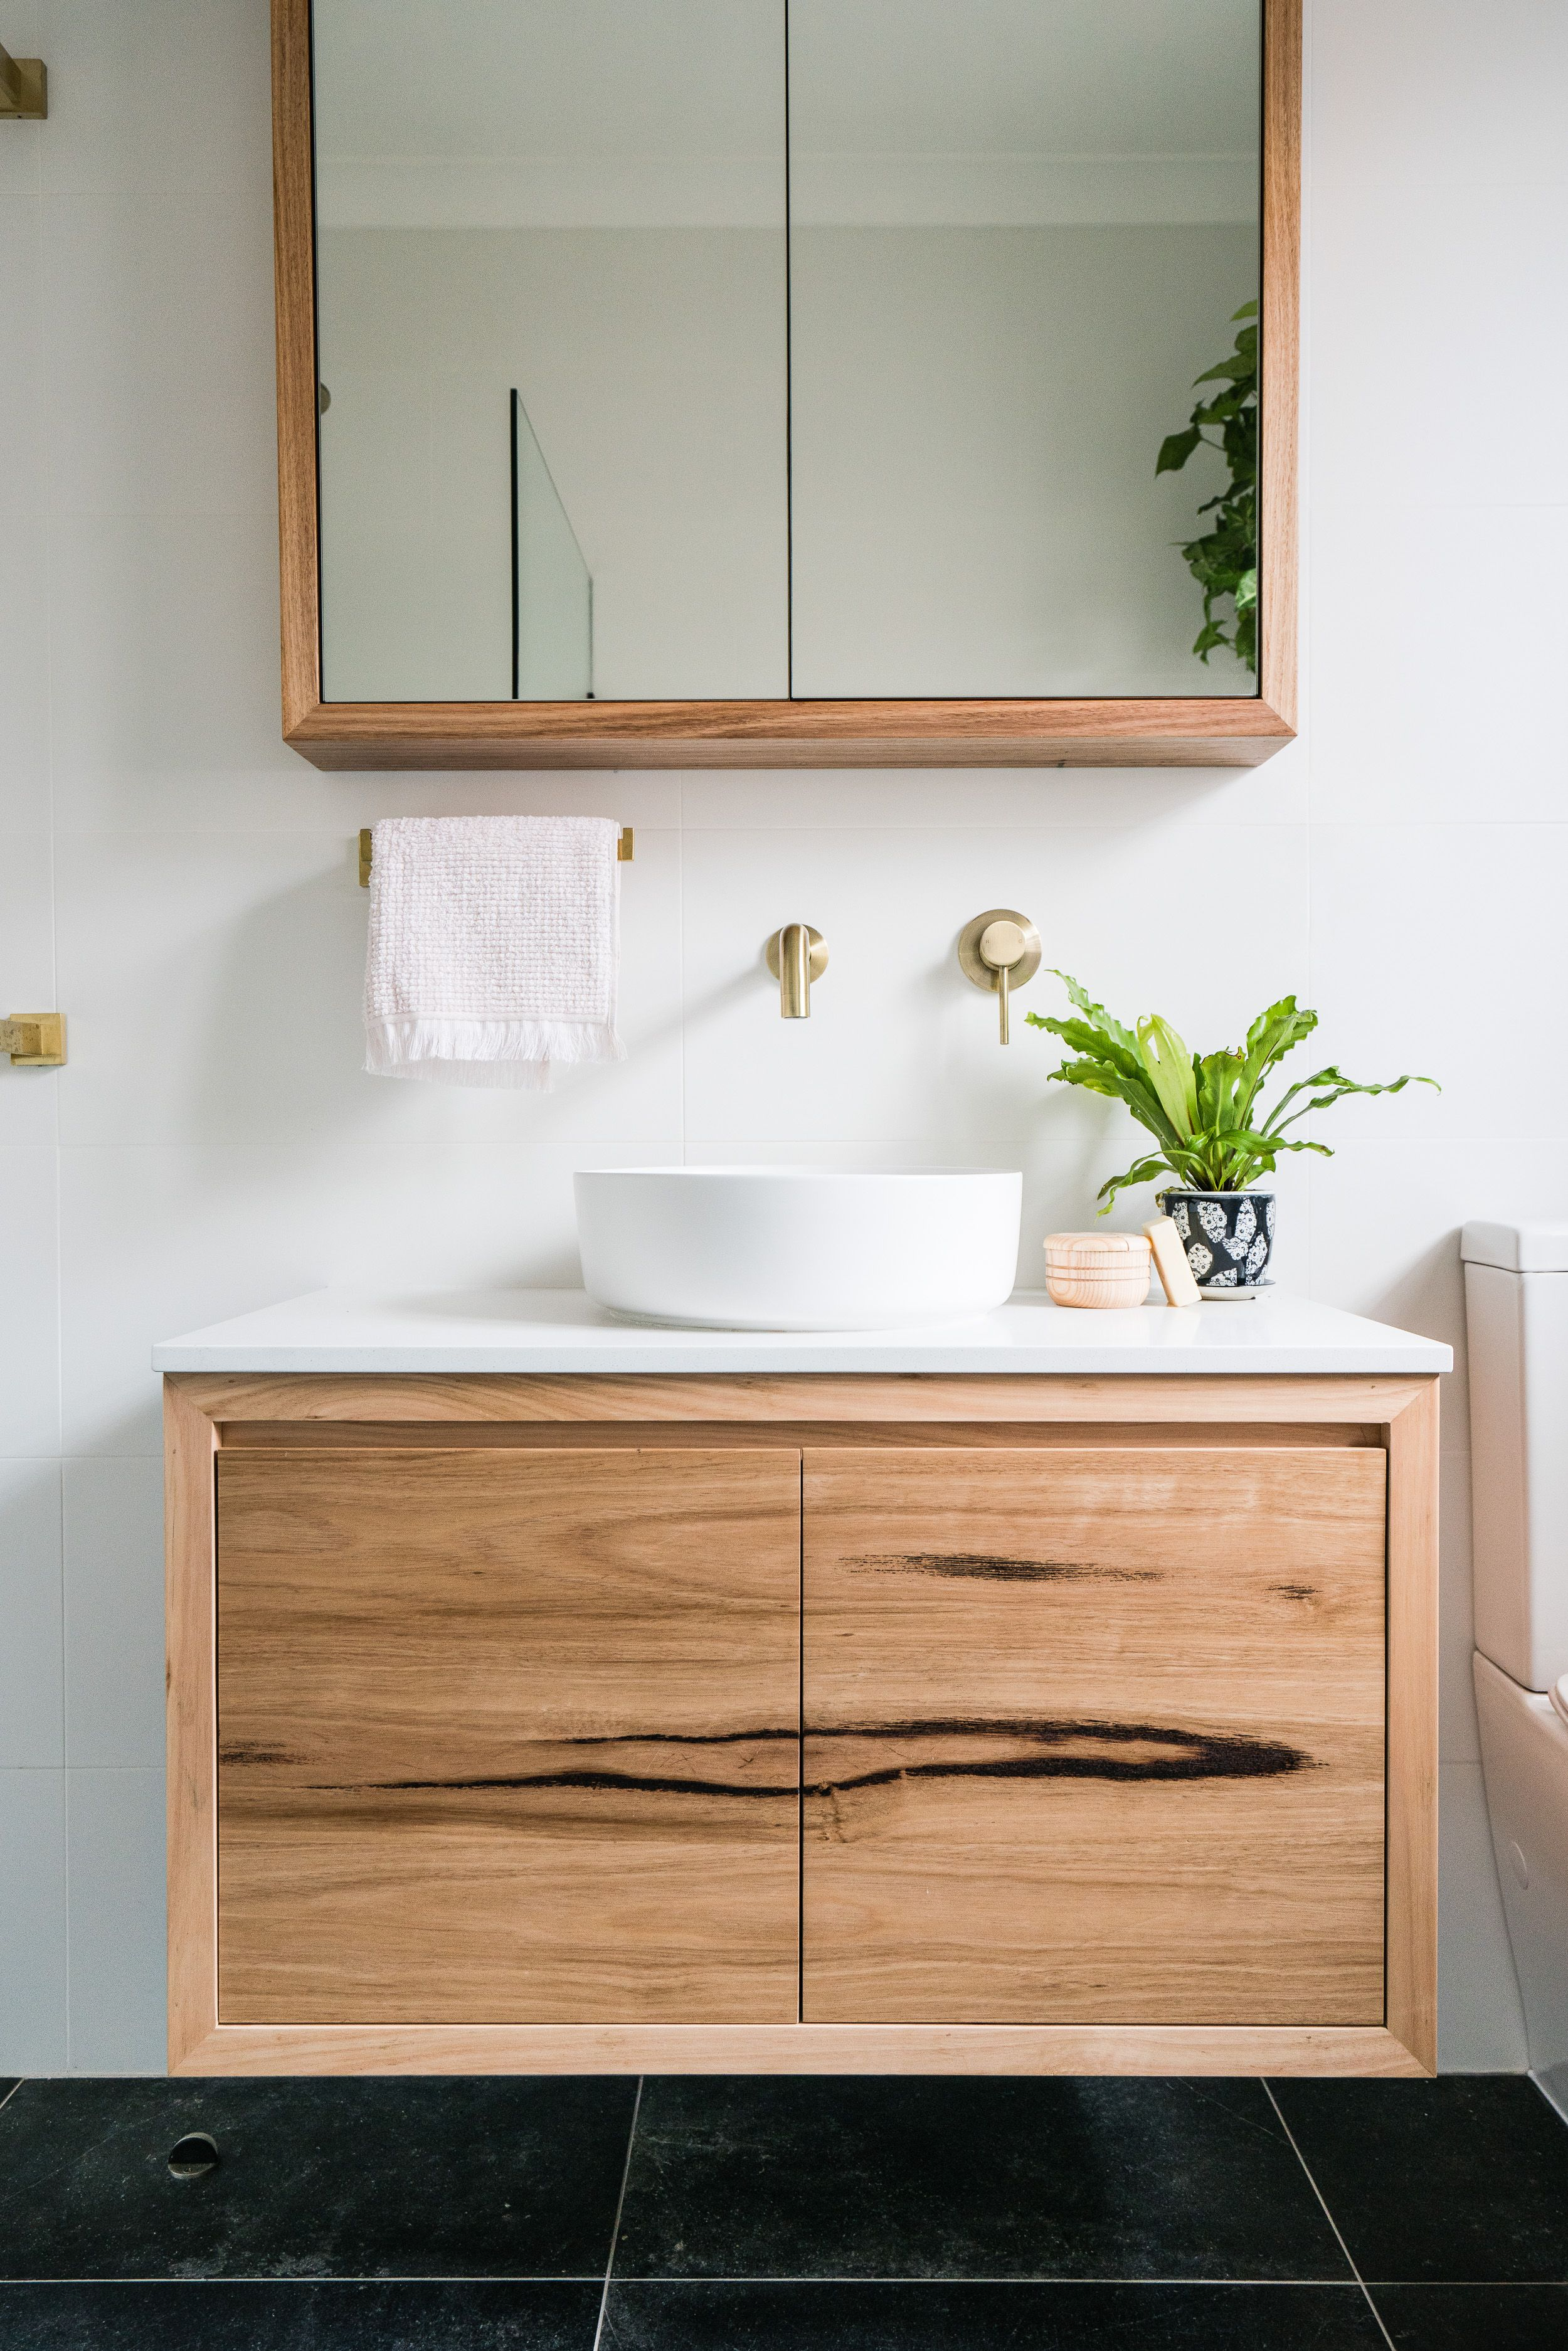 Wormy Chestnut Custom Made Timber Vanity Timber Vanity Bathroom Interior Wooden Bathroom [ 3748 x 2500 Pixel ]